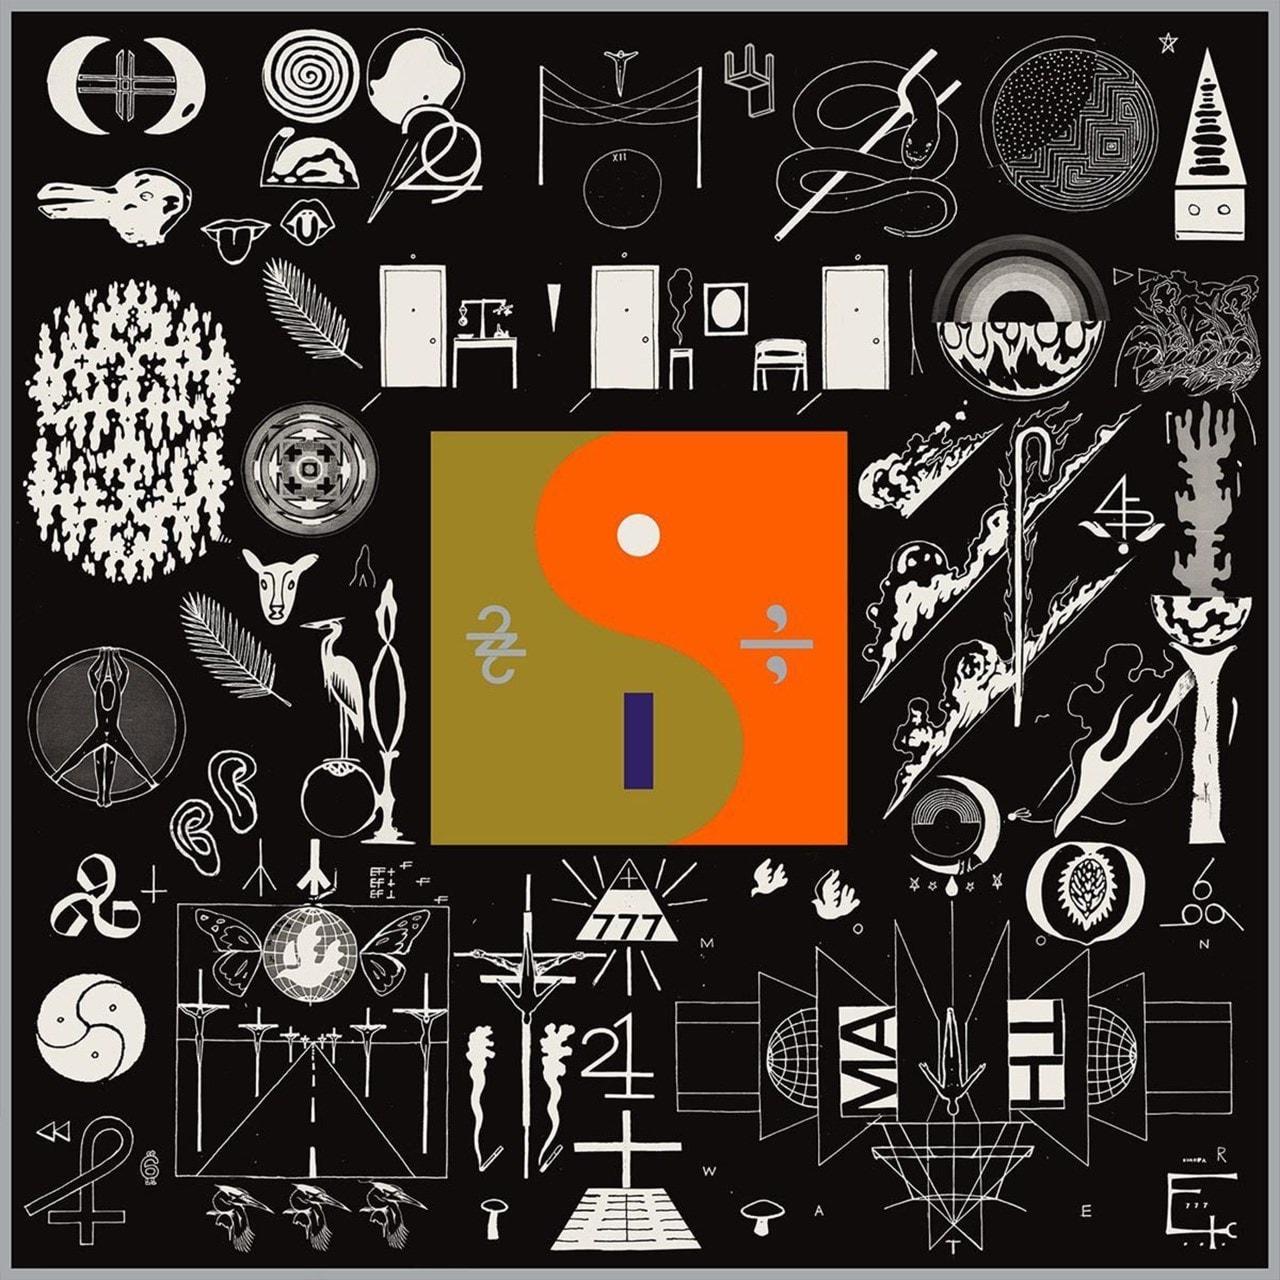 22, a Million - 1